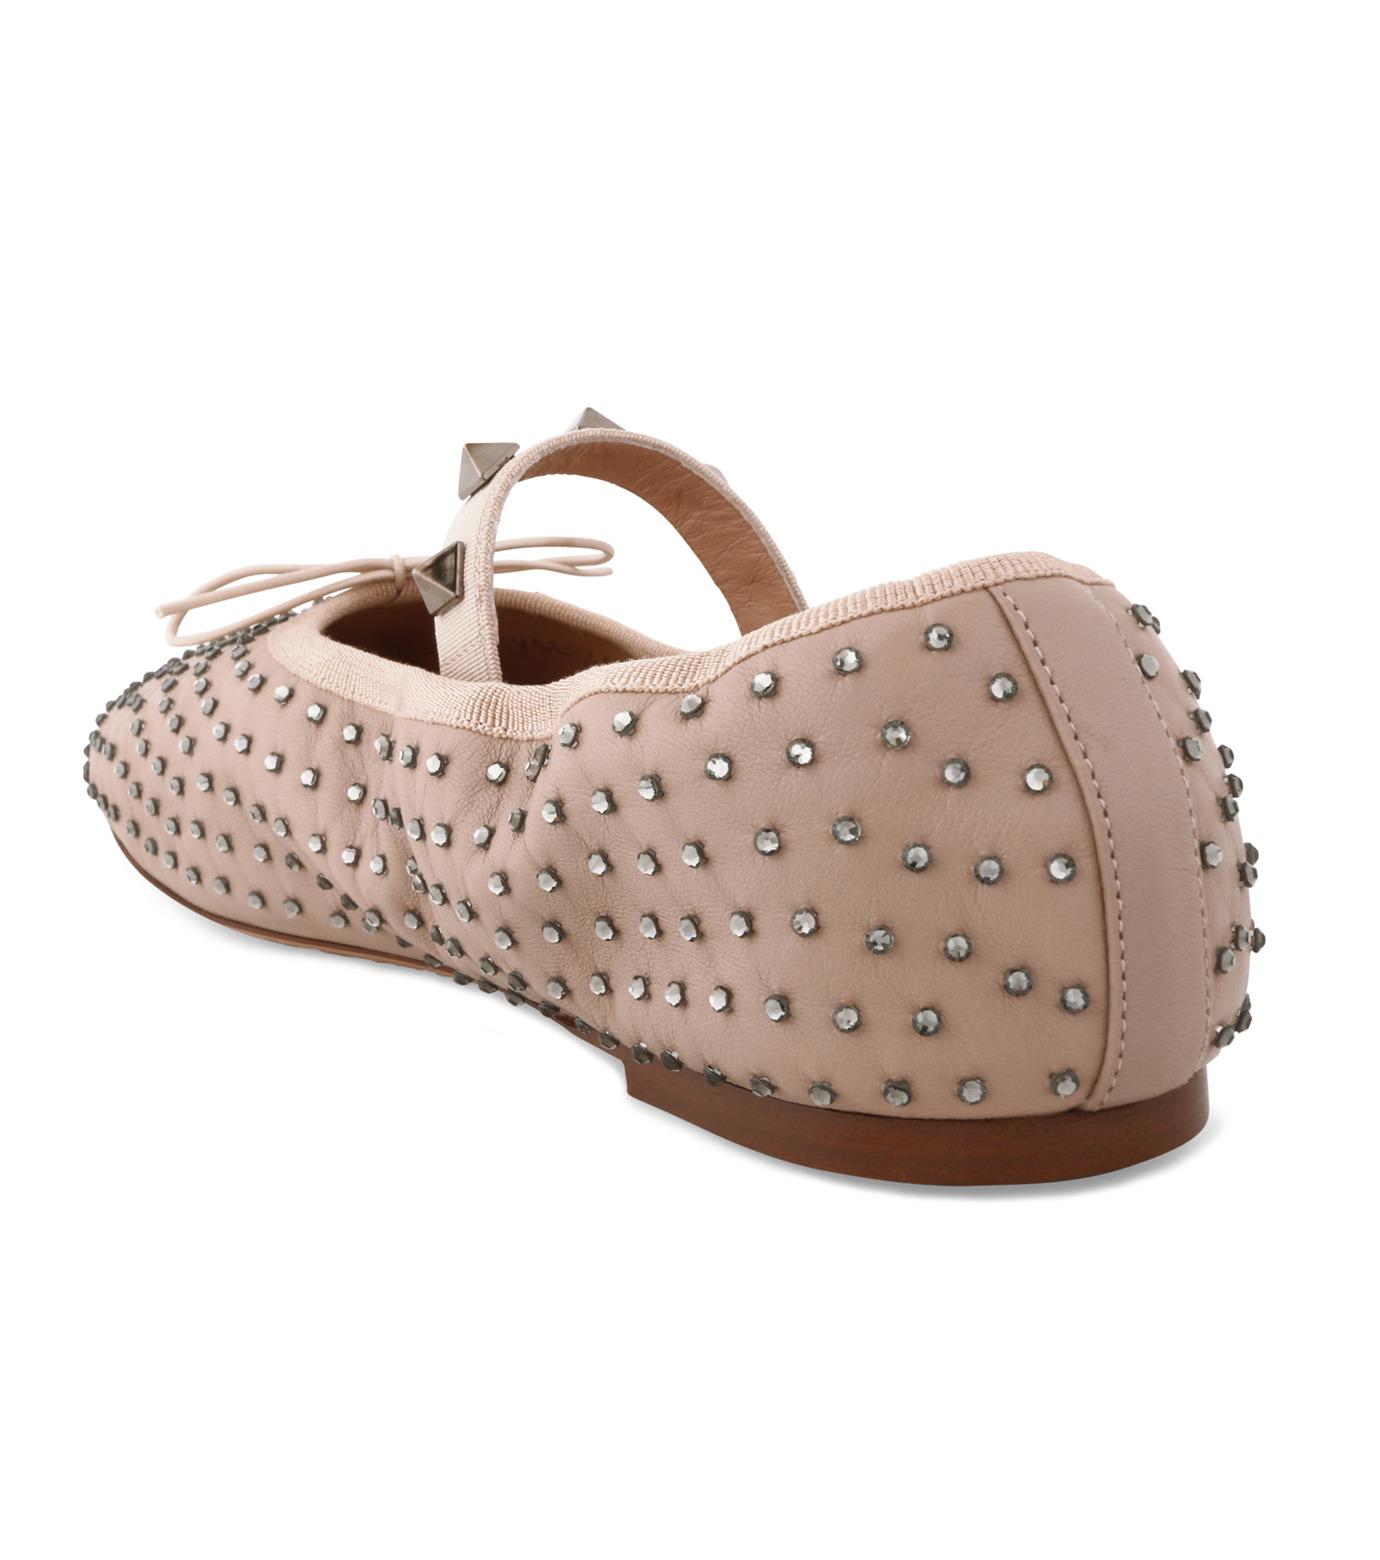 VALENTINO GARAVANI(ヴァレンティノ ガラヴァーニ)のBallerina Flat Strass-BEIGE(フラットシューズ/Flat shoes)-LW0S0A93FNR-52 拡大詳細画像2